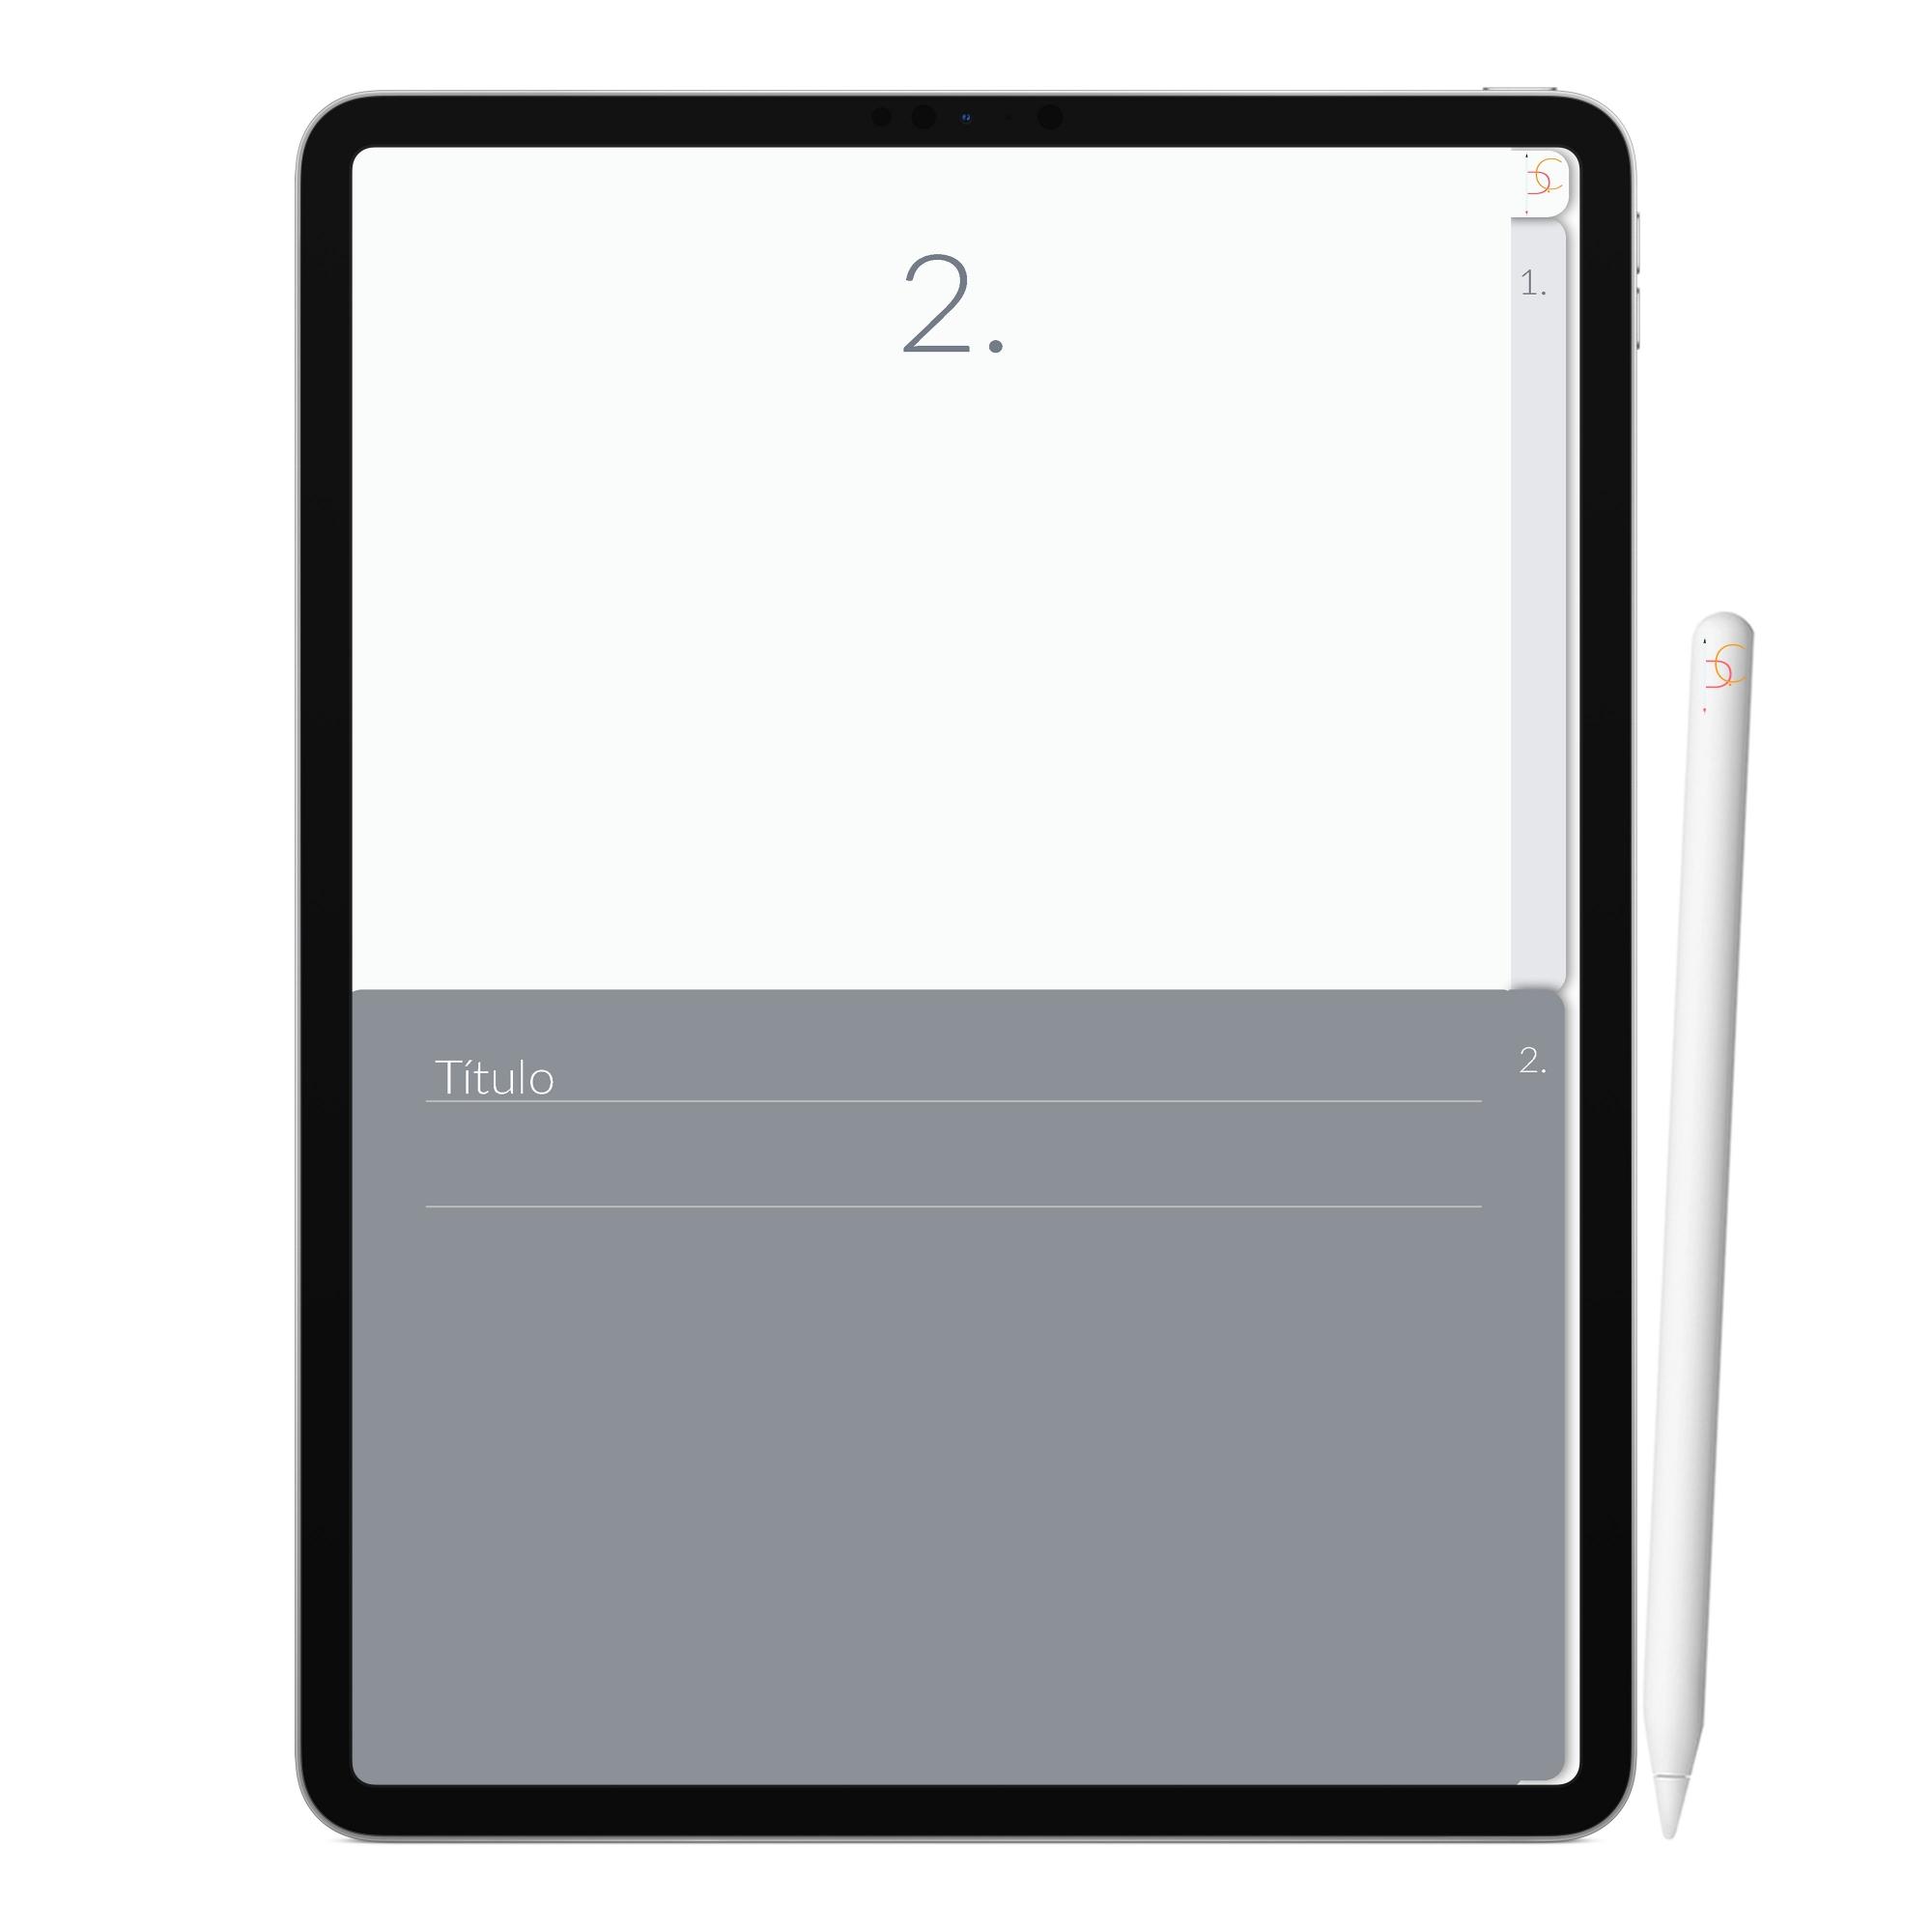 Caderno Digital Goals Metas | Duas Matérias Interativo| iPad Tablet | Download Instantâneo